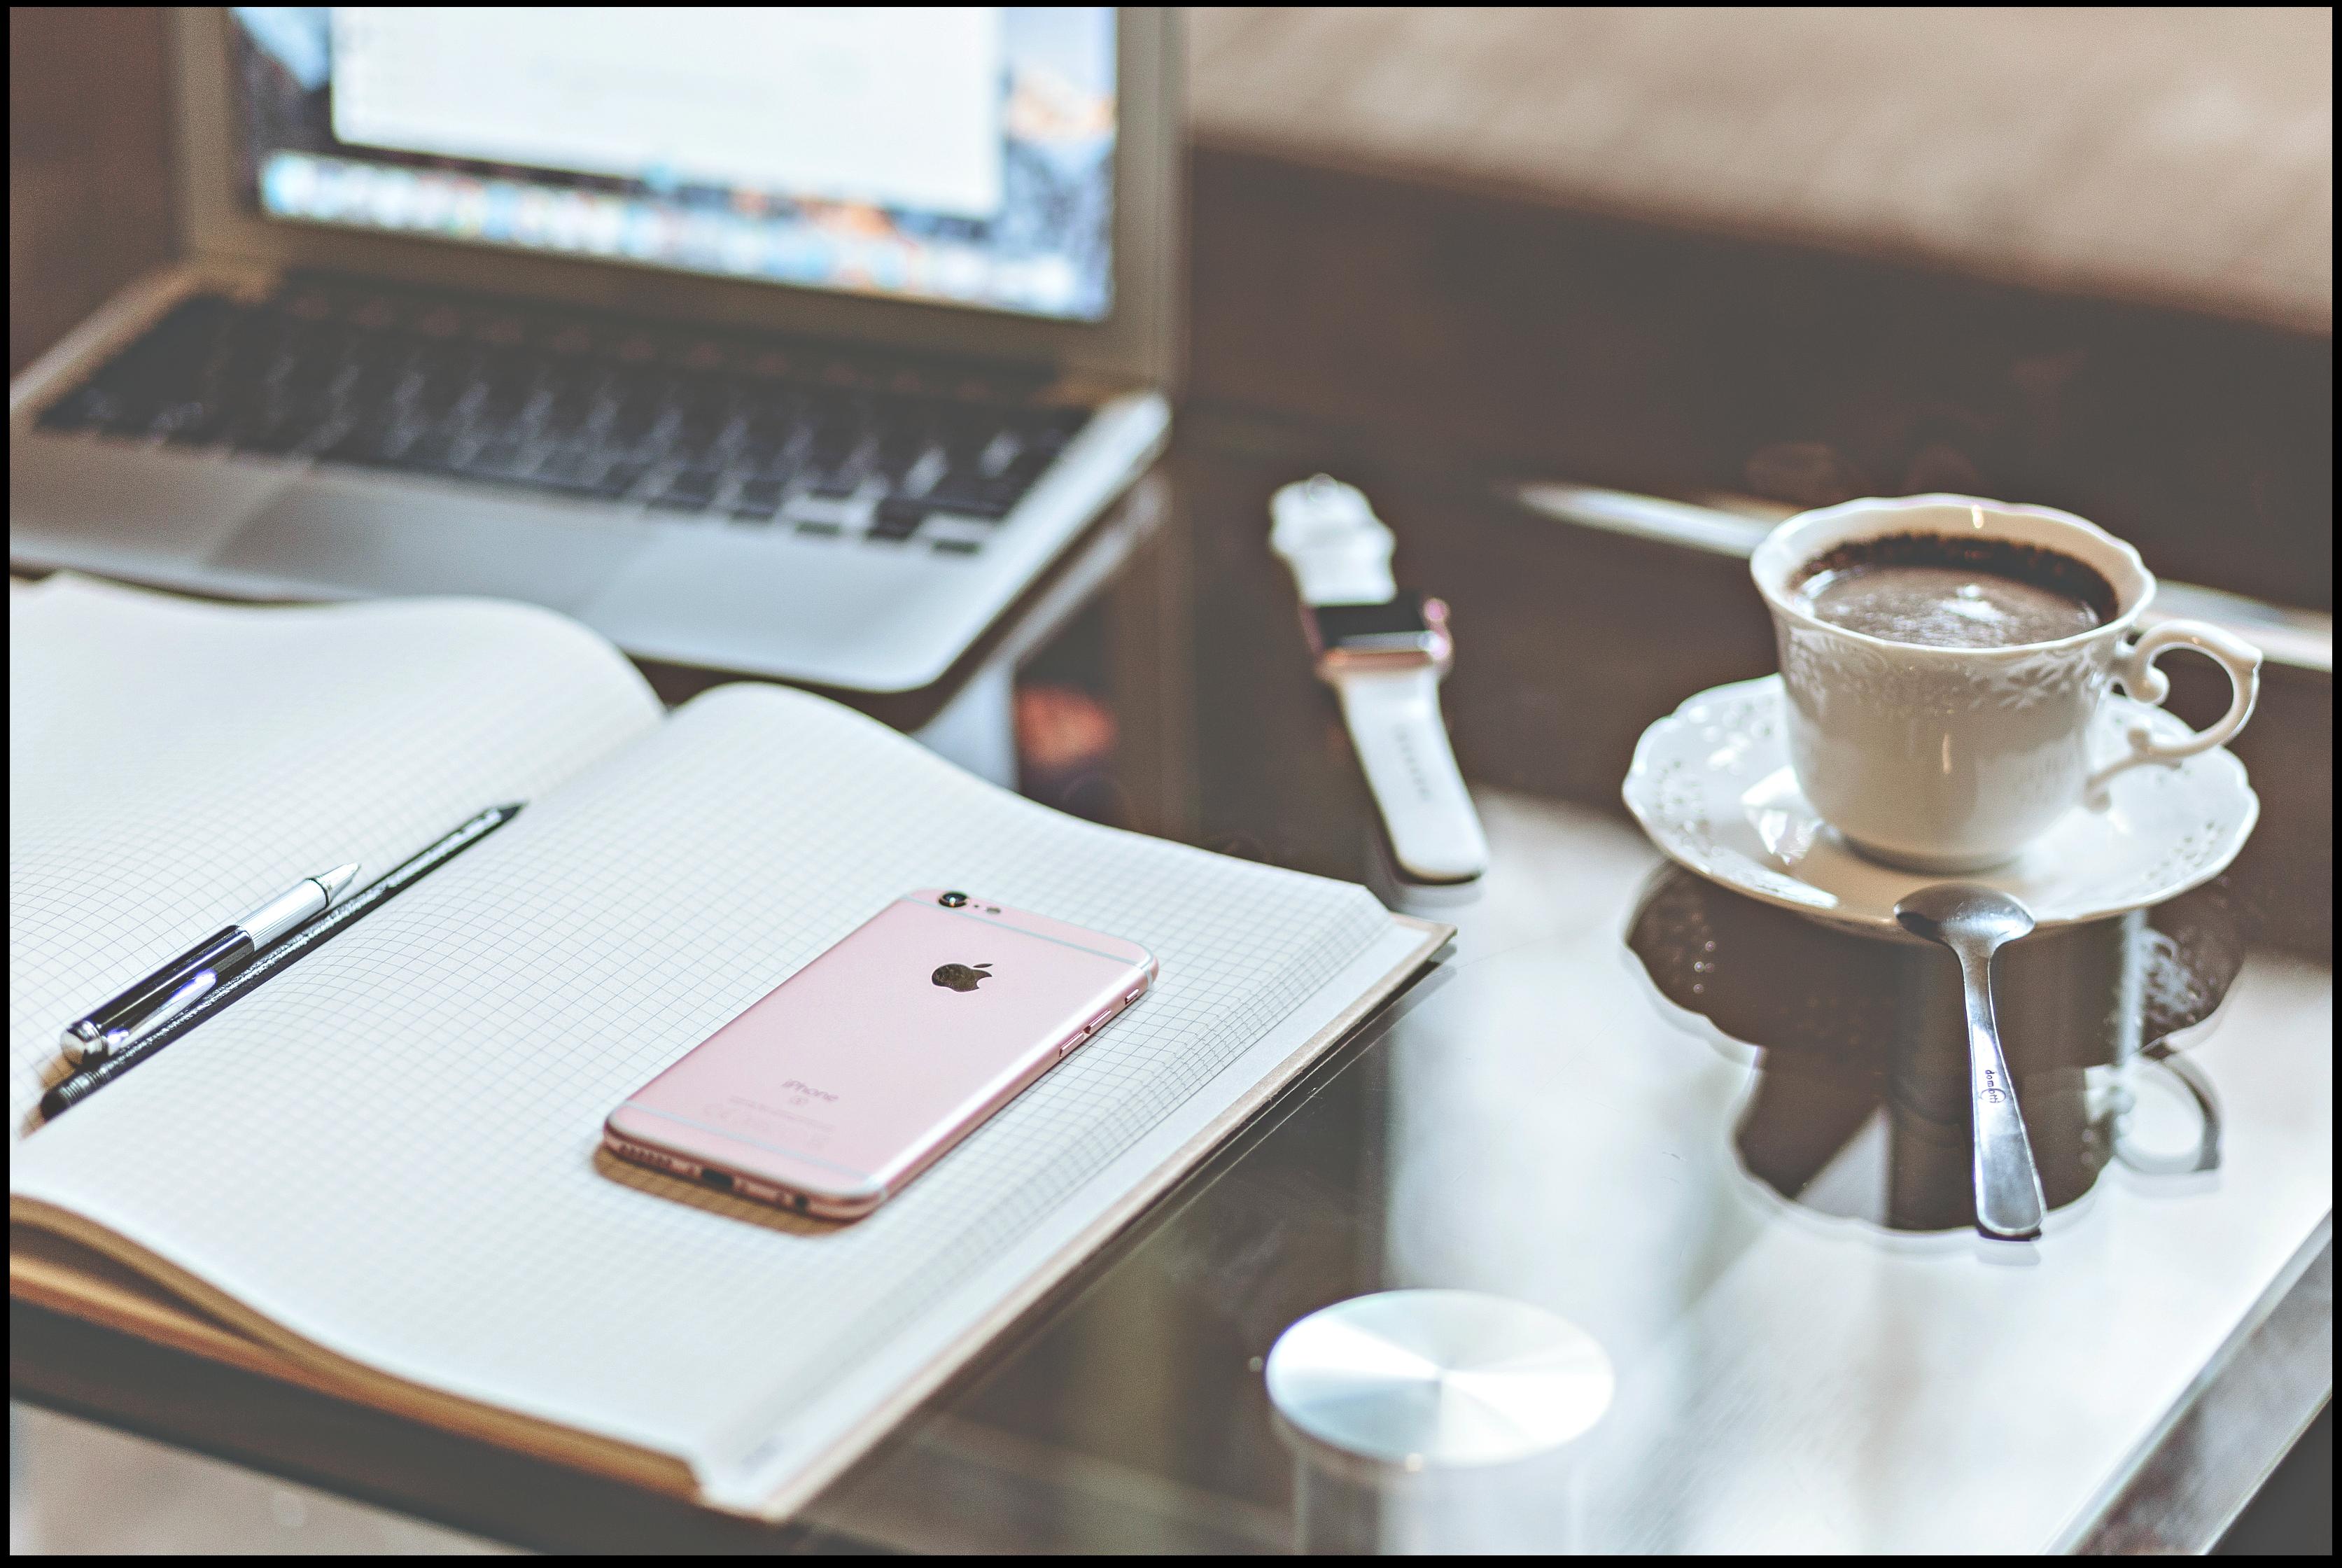 Desktop with laptop computer, open journal, pen, iPhone, cup of coffee